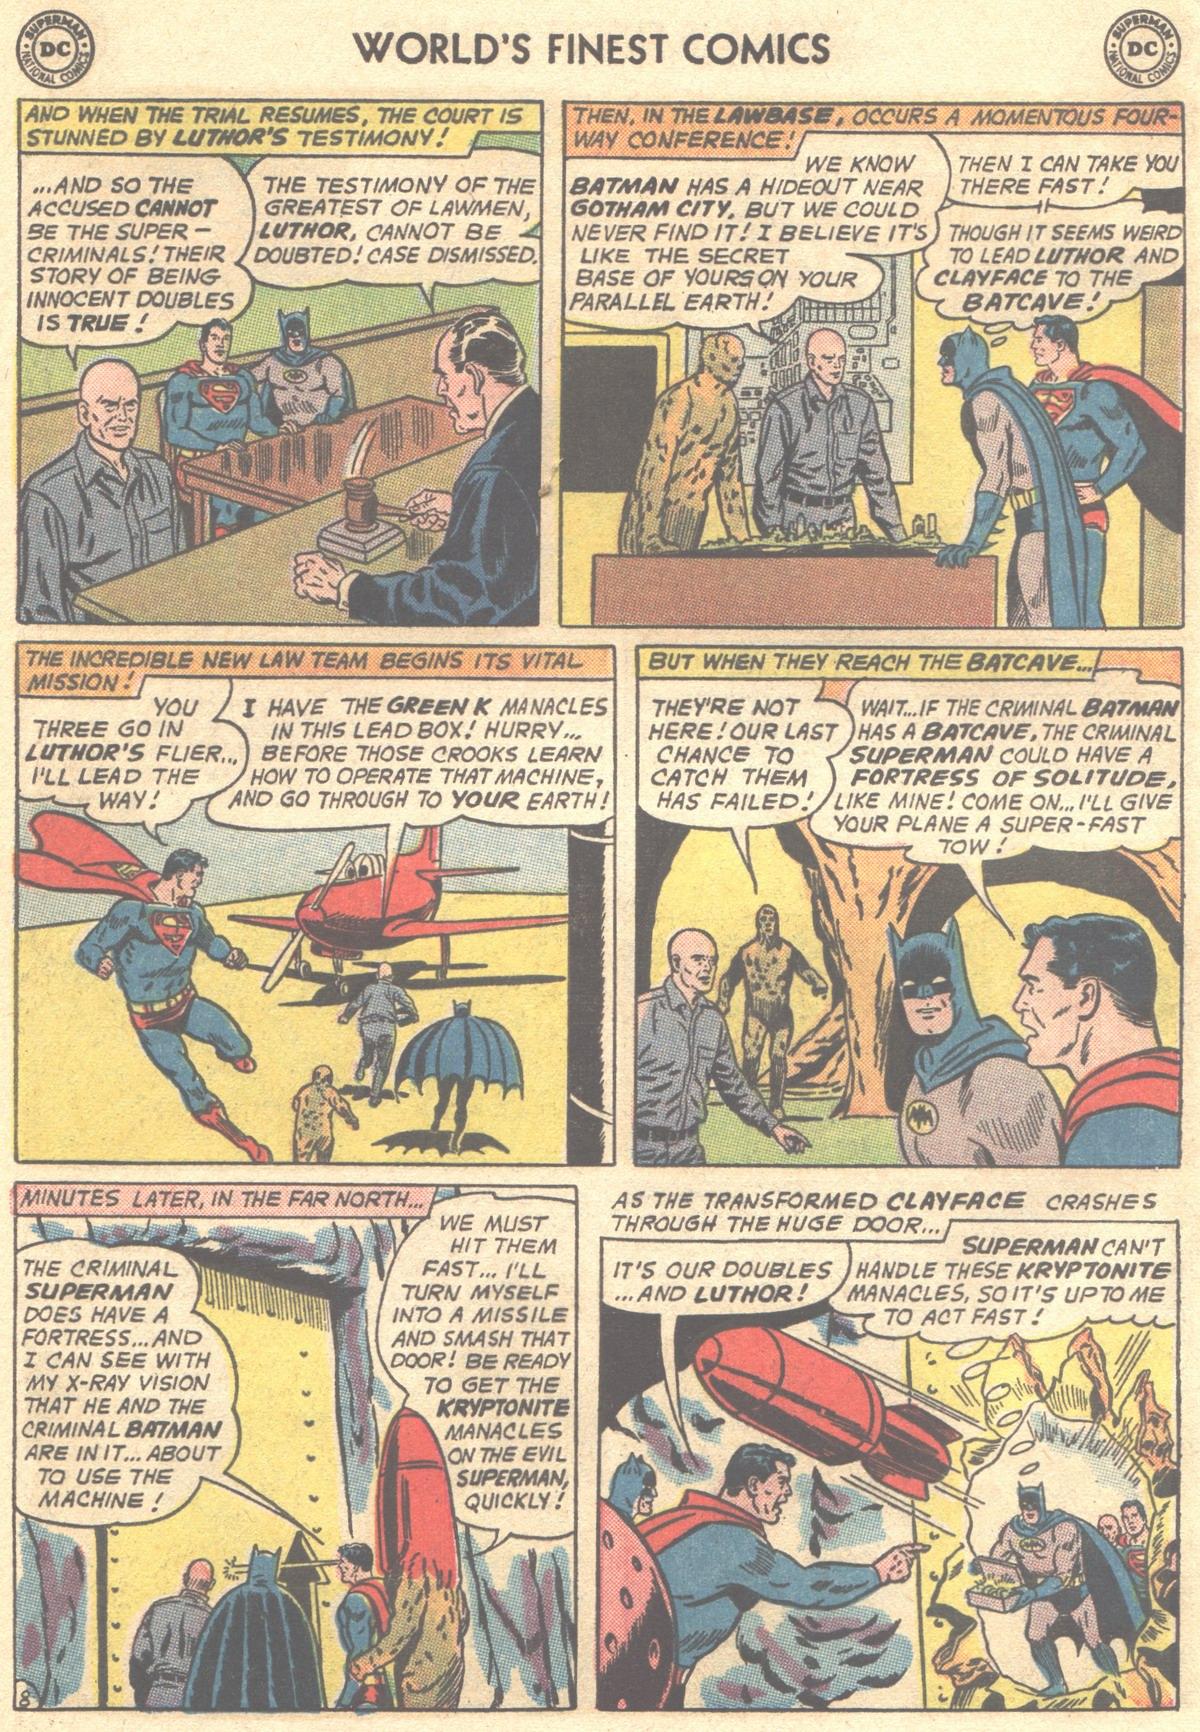 Read online World's Finest Comics comic -  Issue #148 - 20